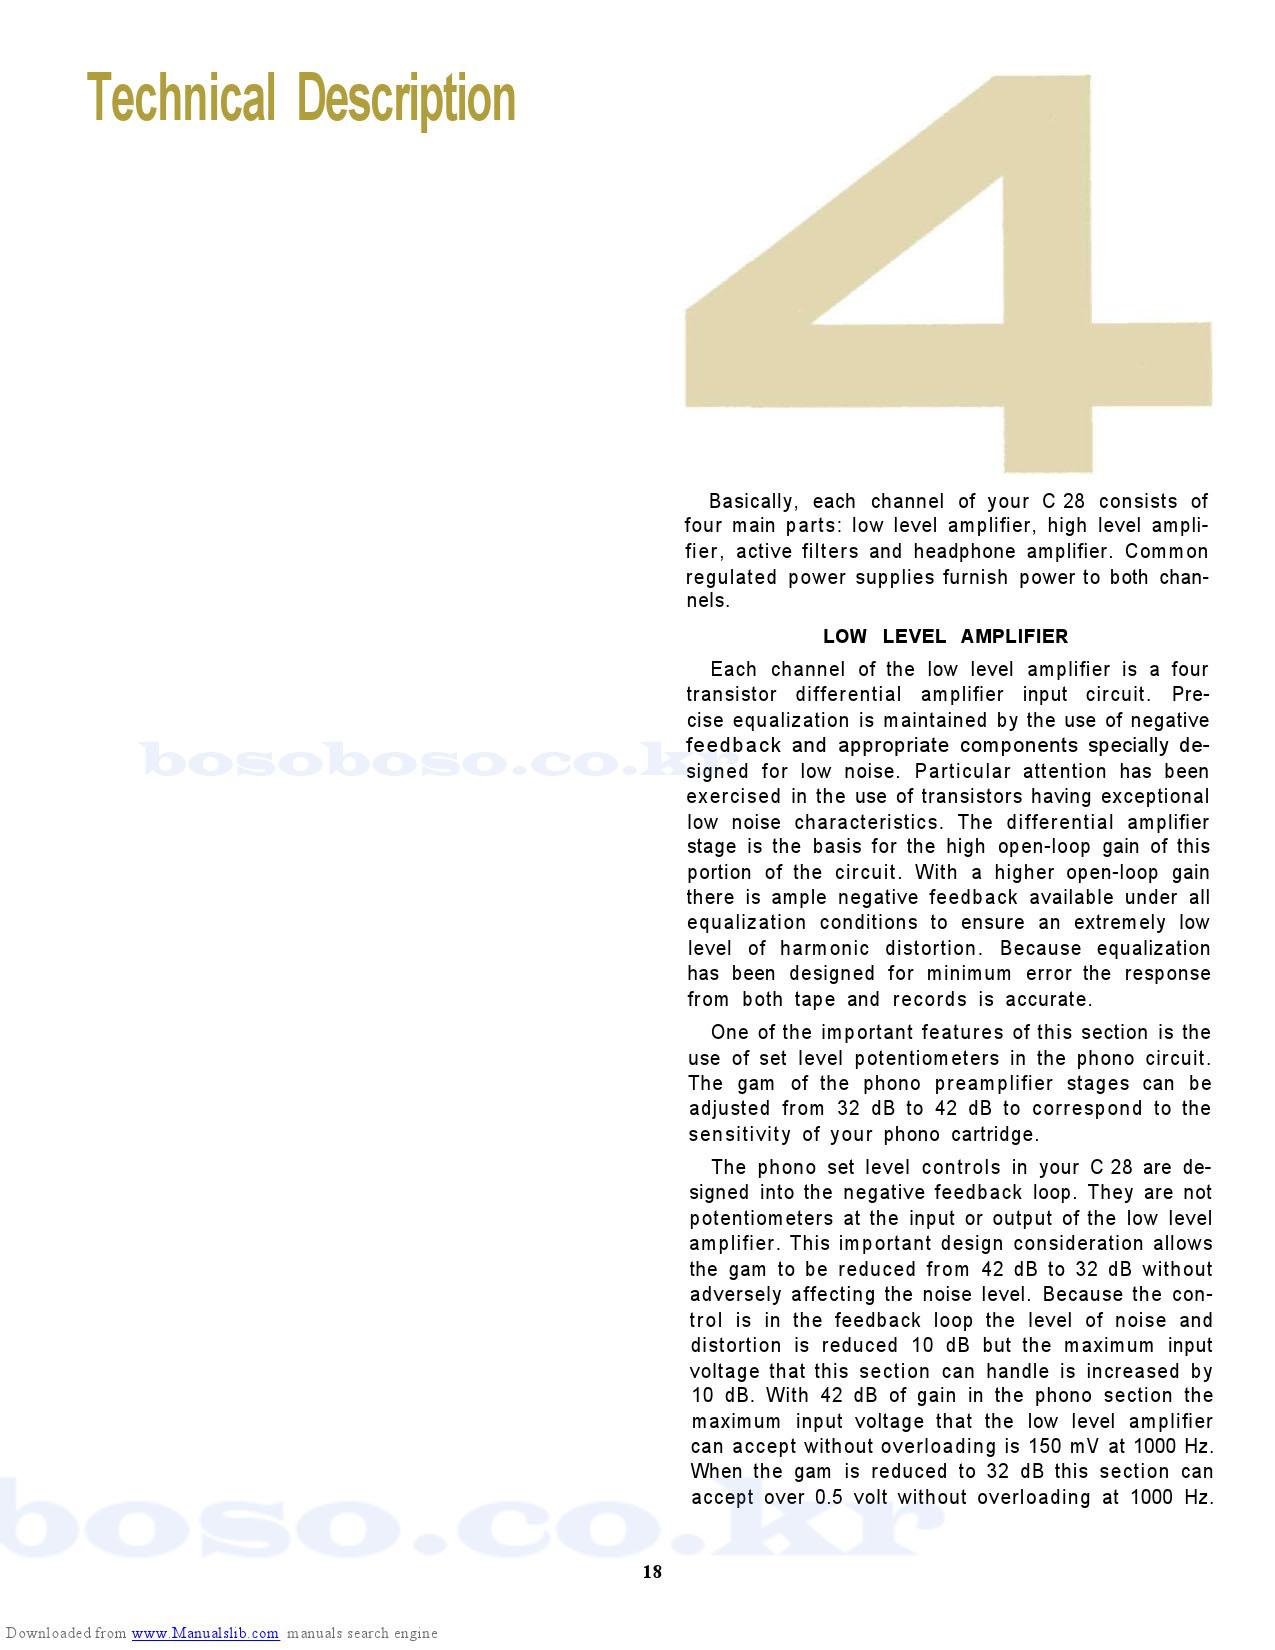 c28 (2)-18.jpg